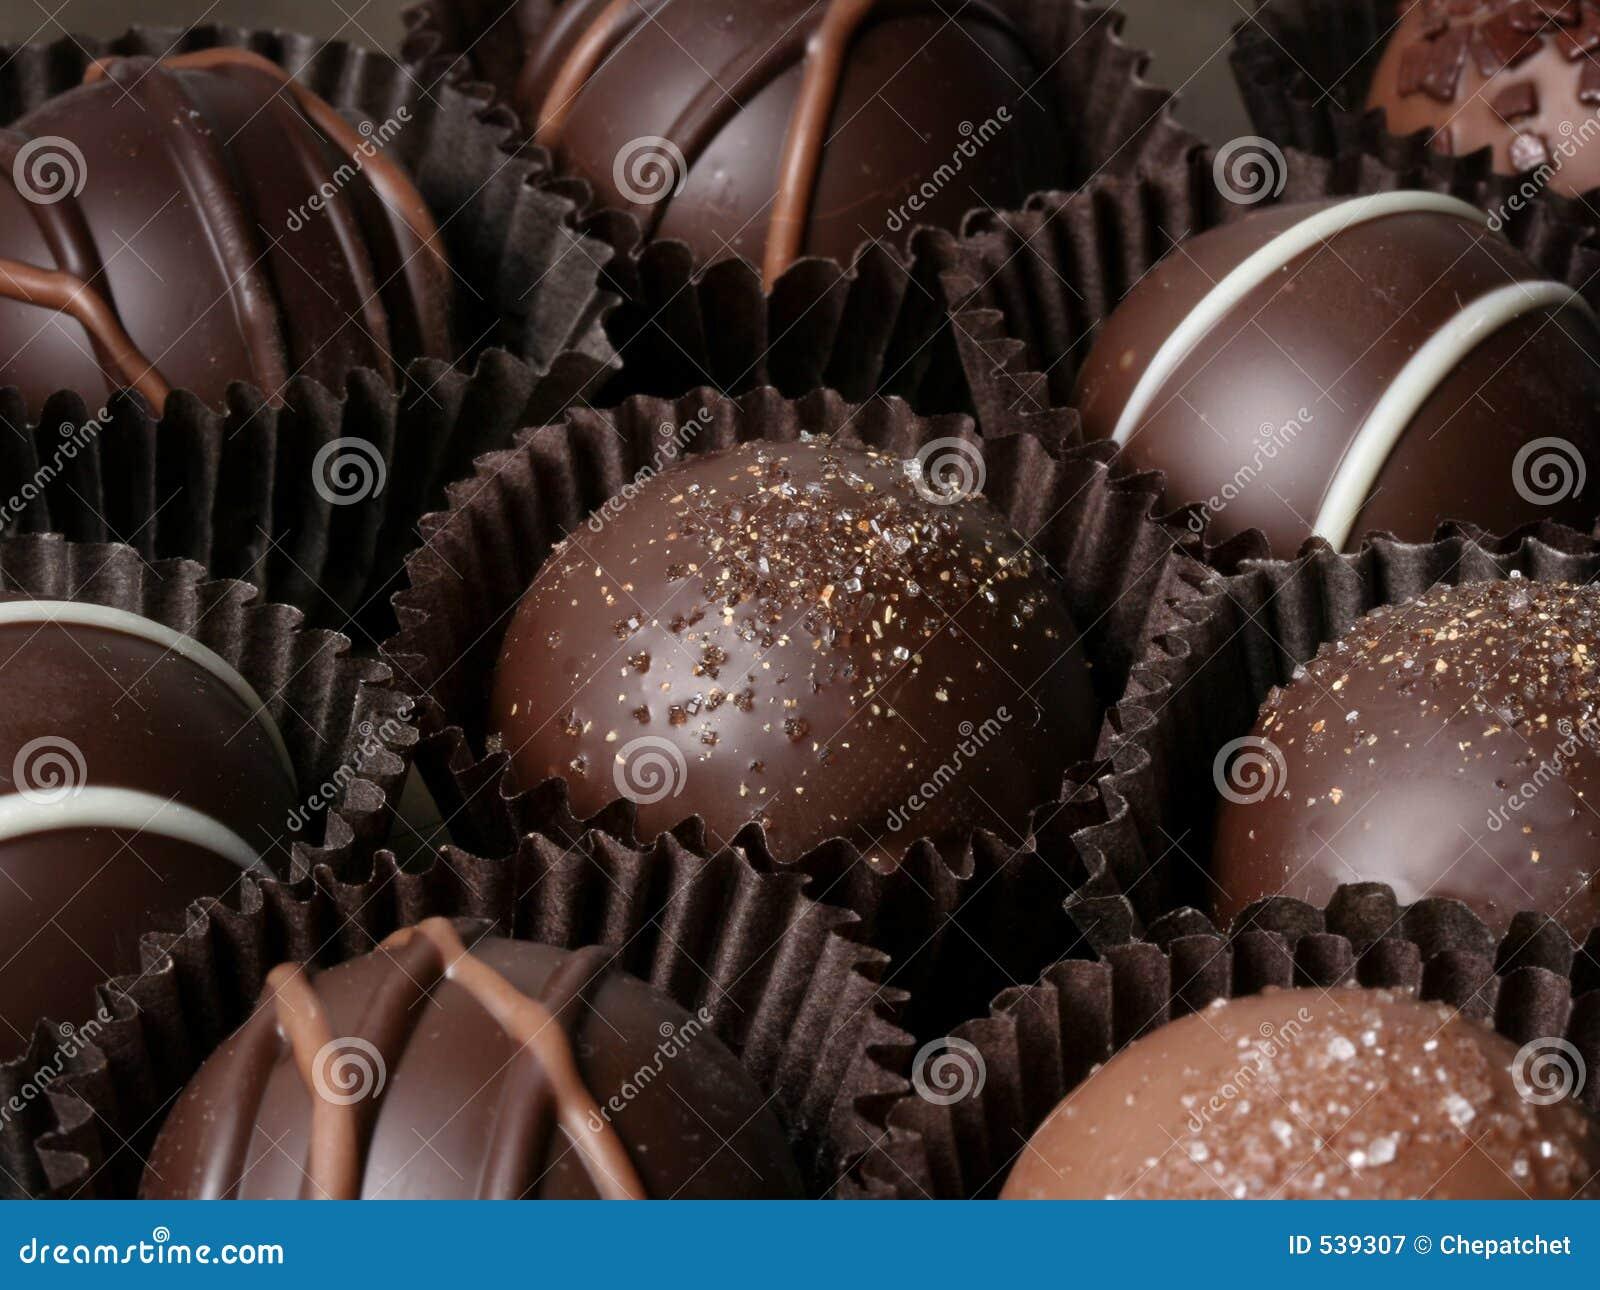 Download 块菌 库存图片. 图片 包括有 诱惑, 卡路里, 华伦泰, 装饰, 黑暗, 欢欣, 存在, 糖果, 浪漫, 巧克力 - 539307